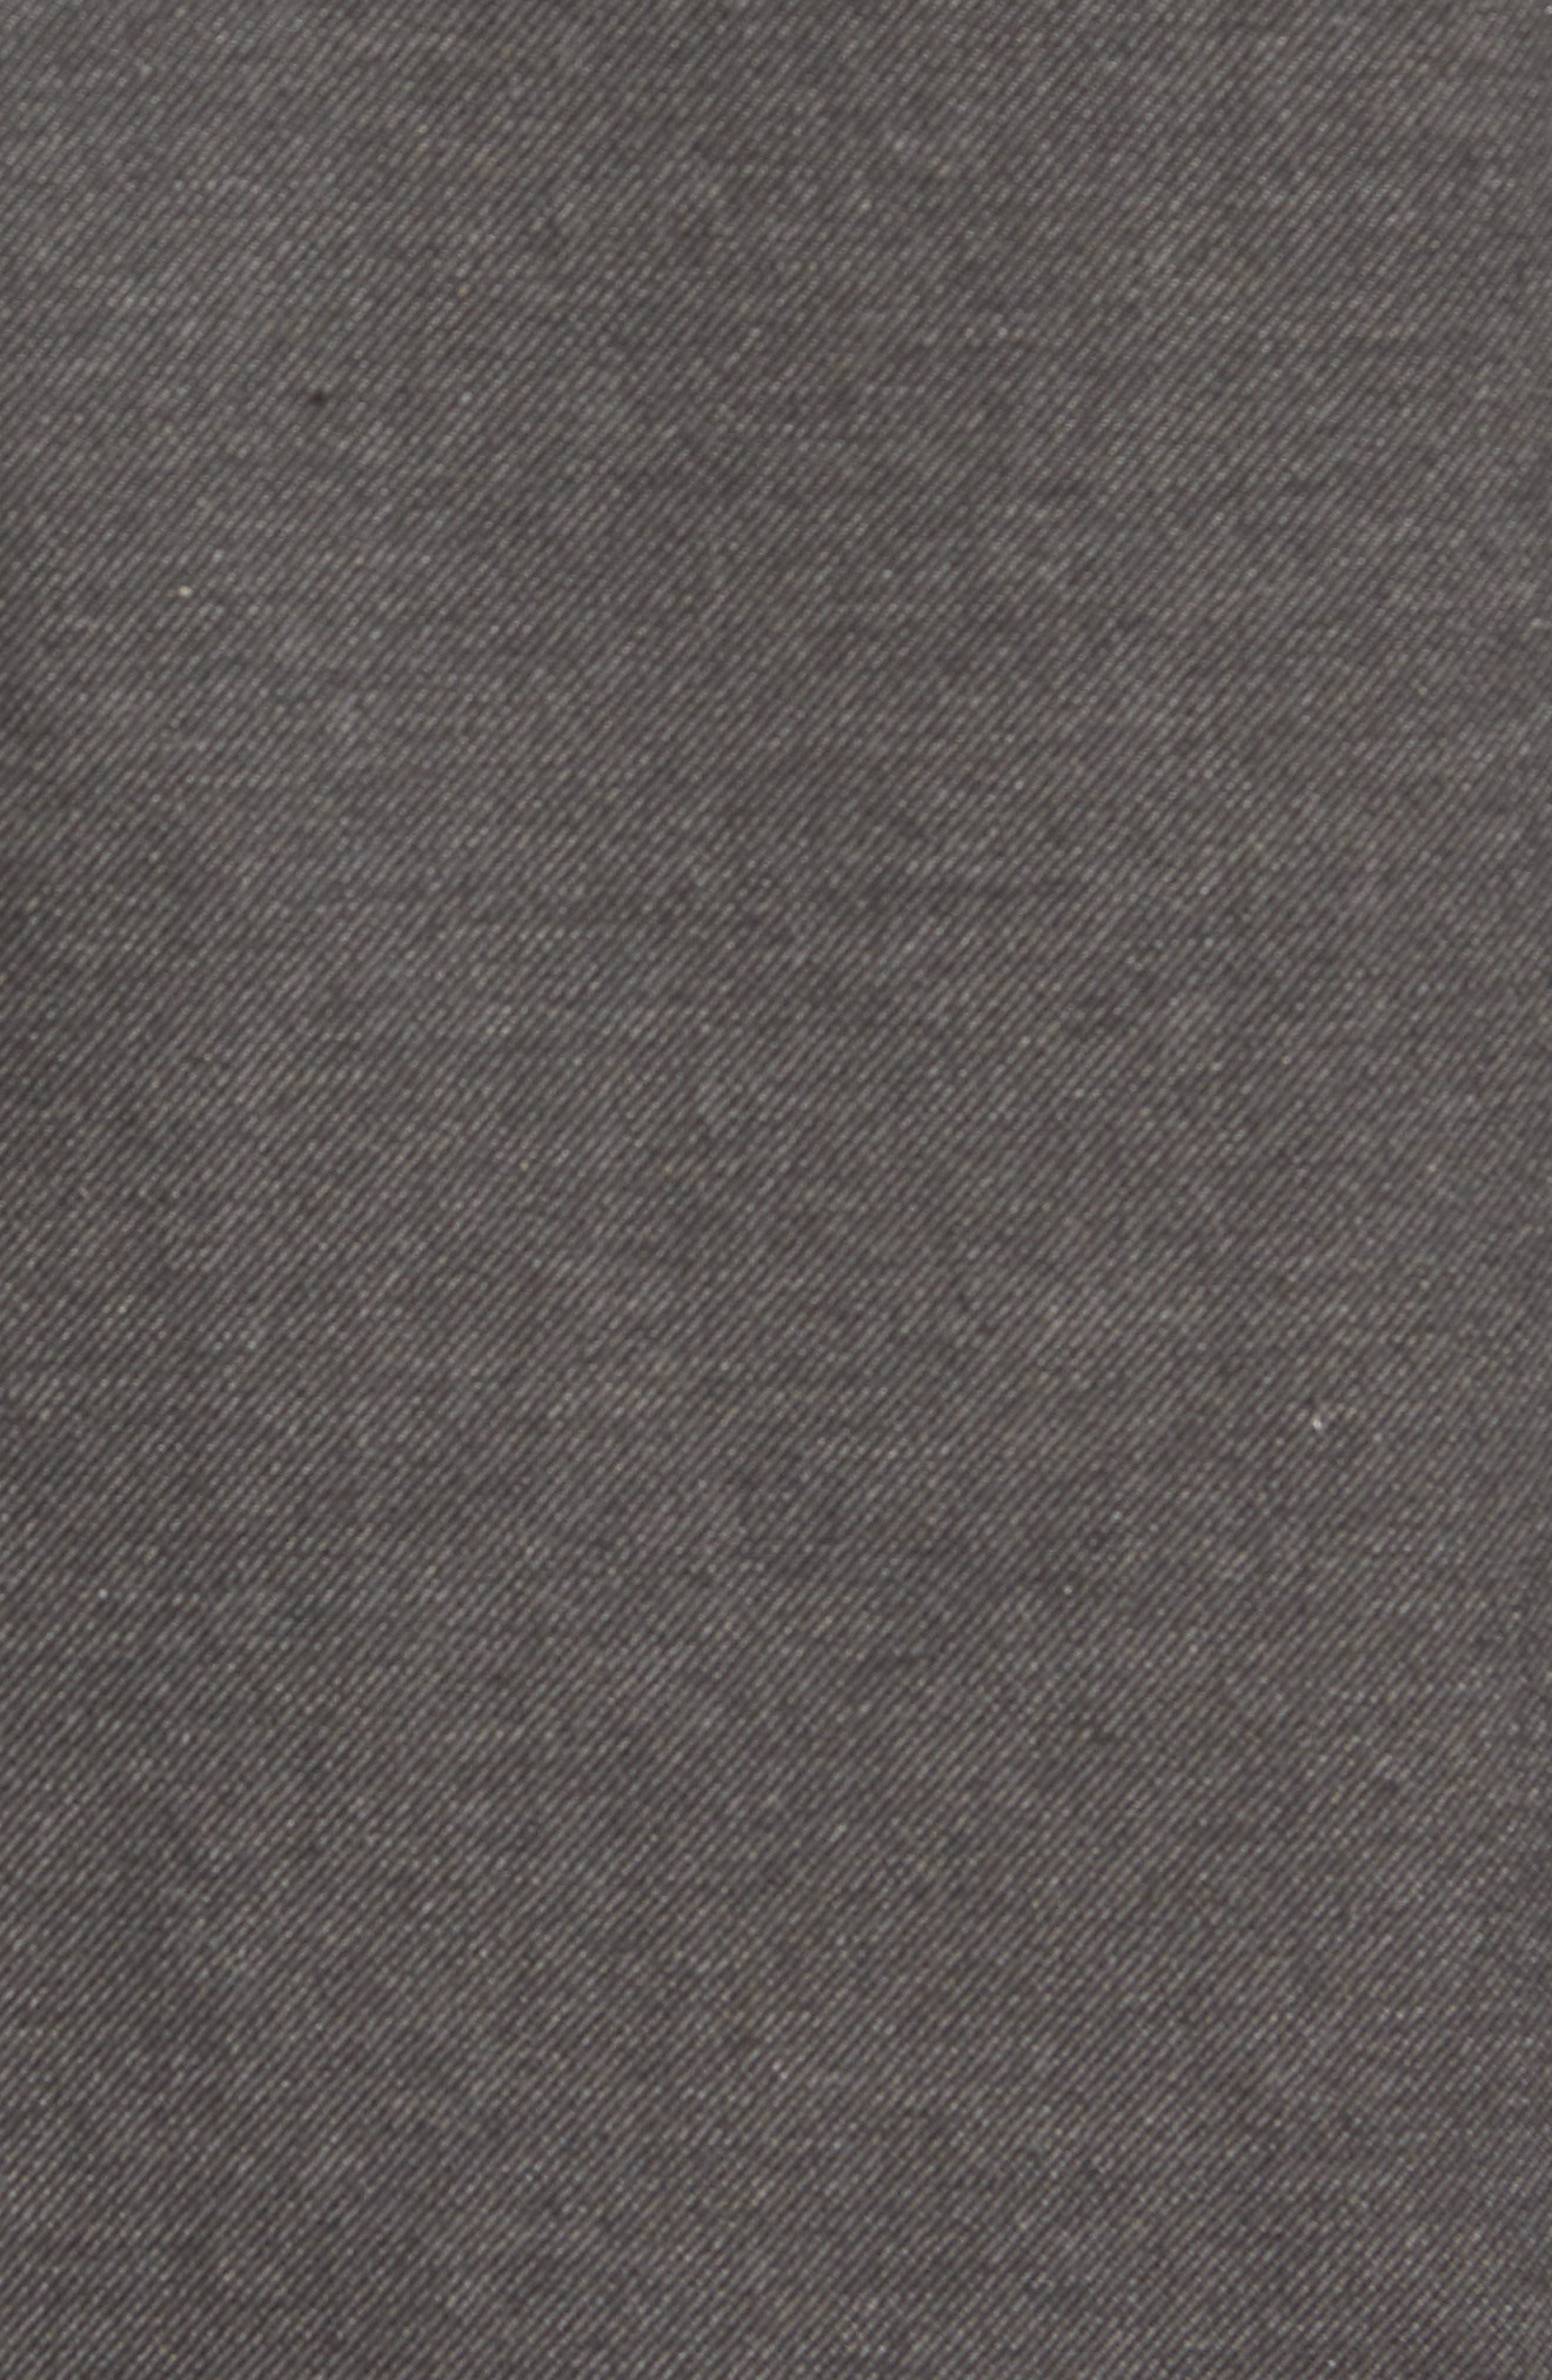 Regular Fit Flannel Sport Shirt,                             Alternate thumbnail 5, color,                             Charcoal Mel